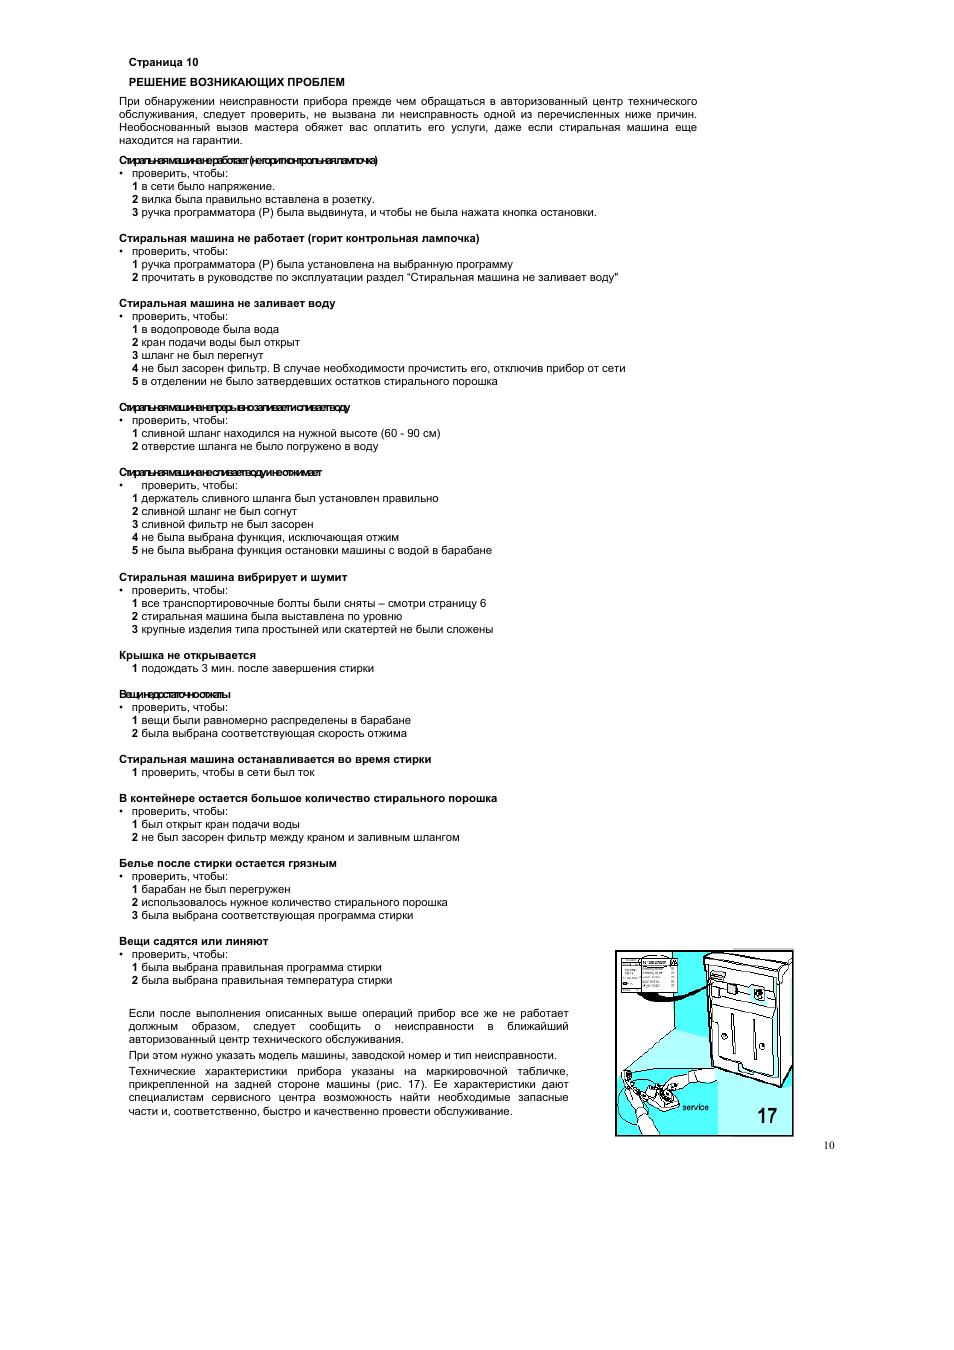 Ardo tl 600 x инструкция по эксплуатации онлайн [7/12].